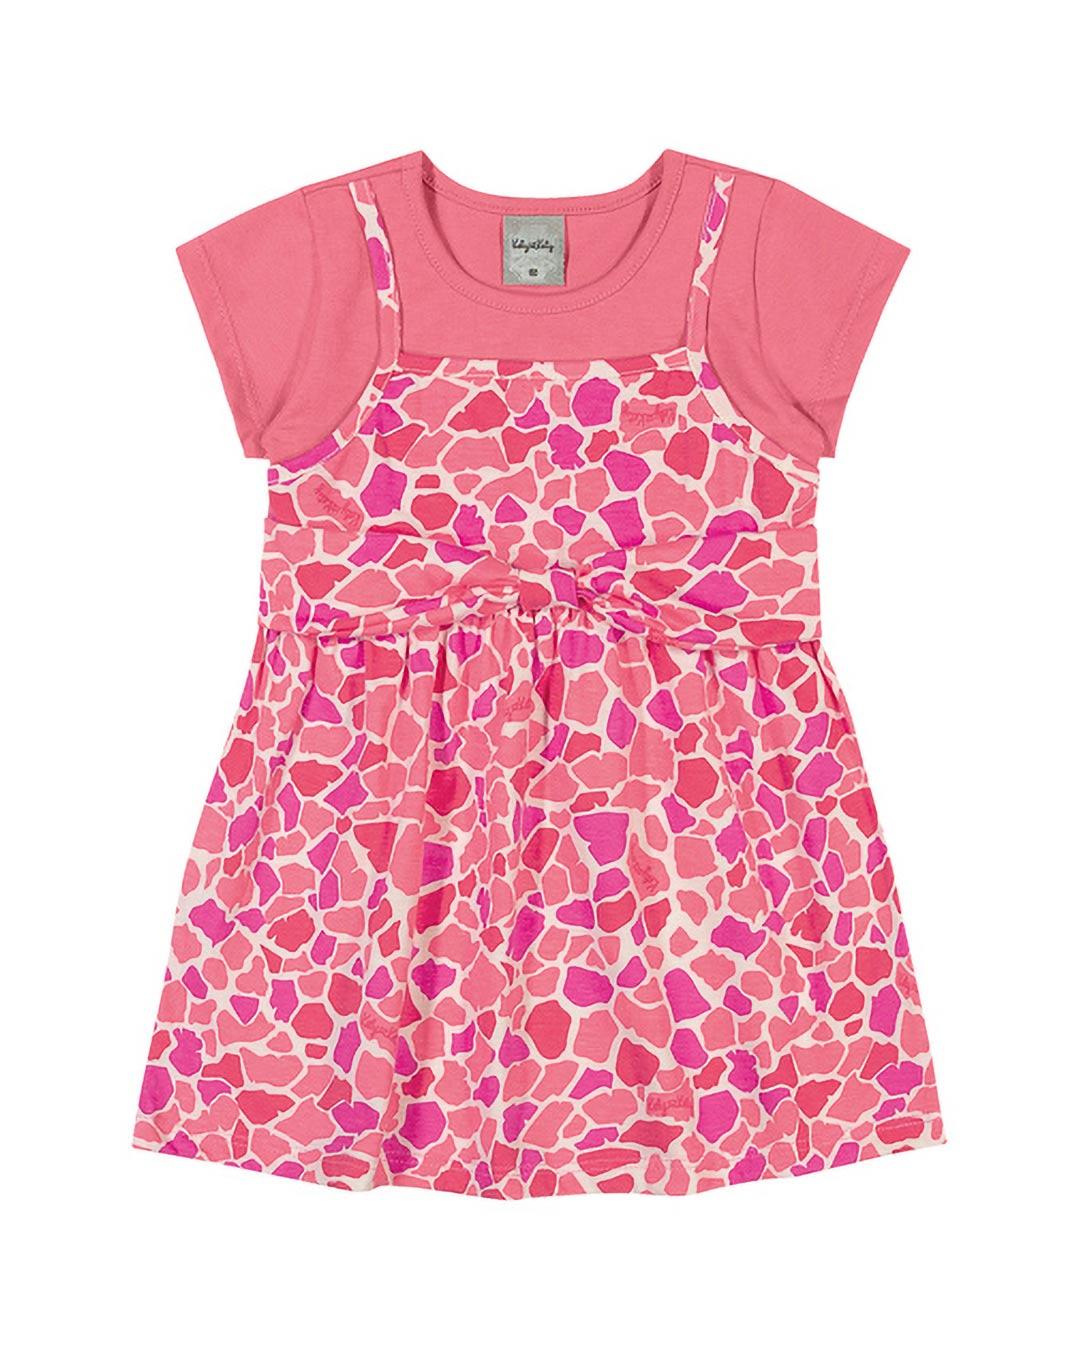 Vestido Infantil Oncinha - Kely & Kety